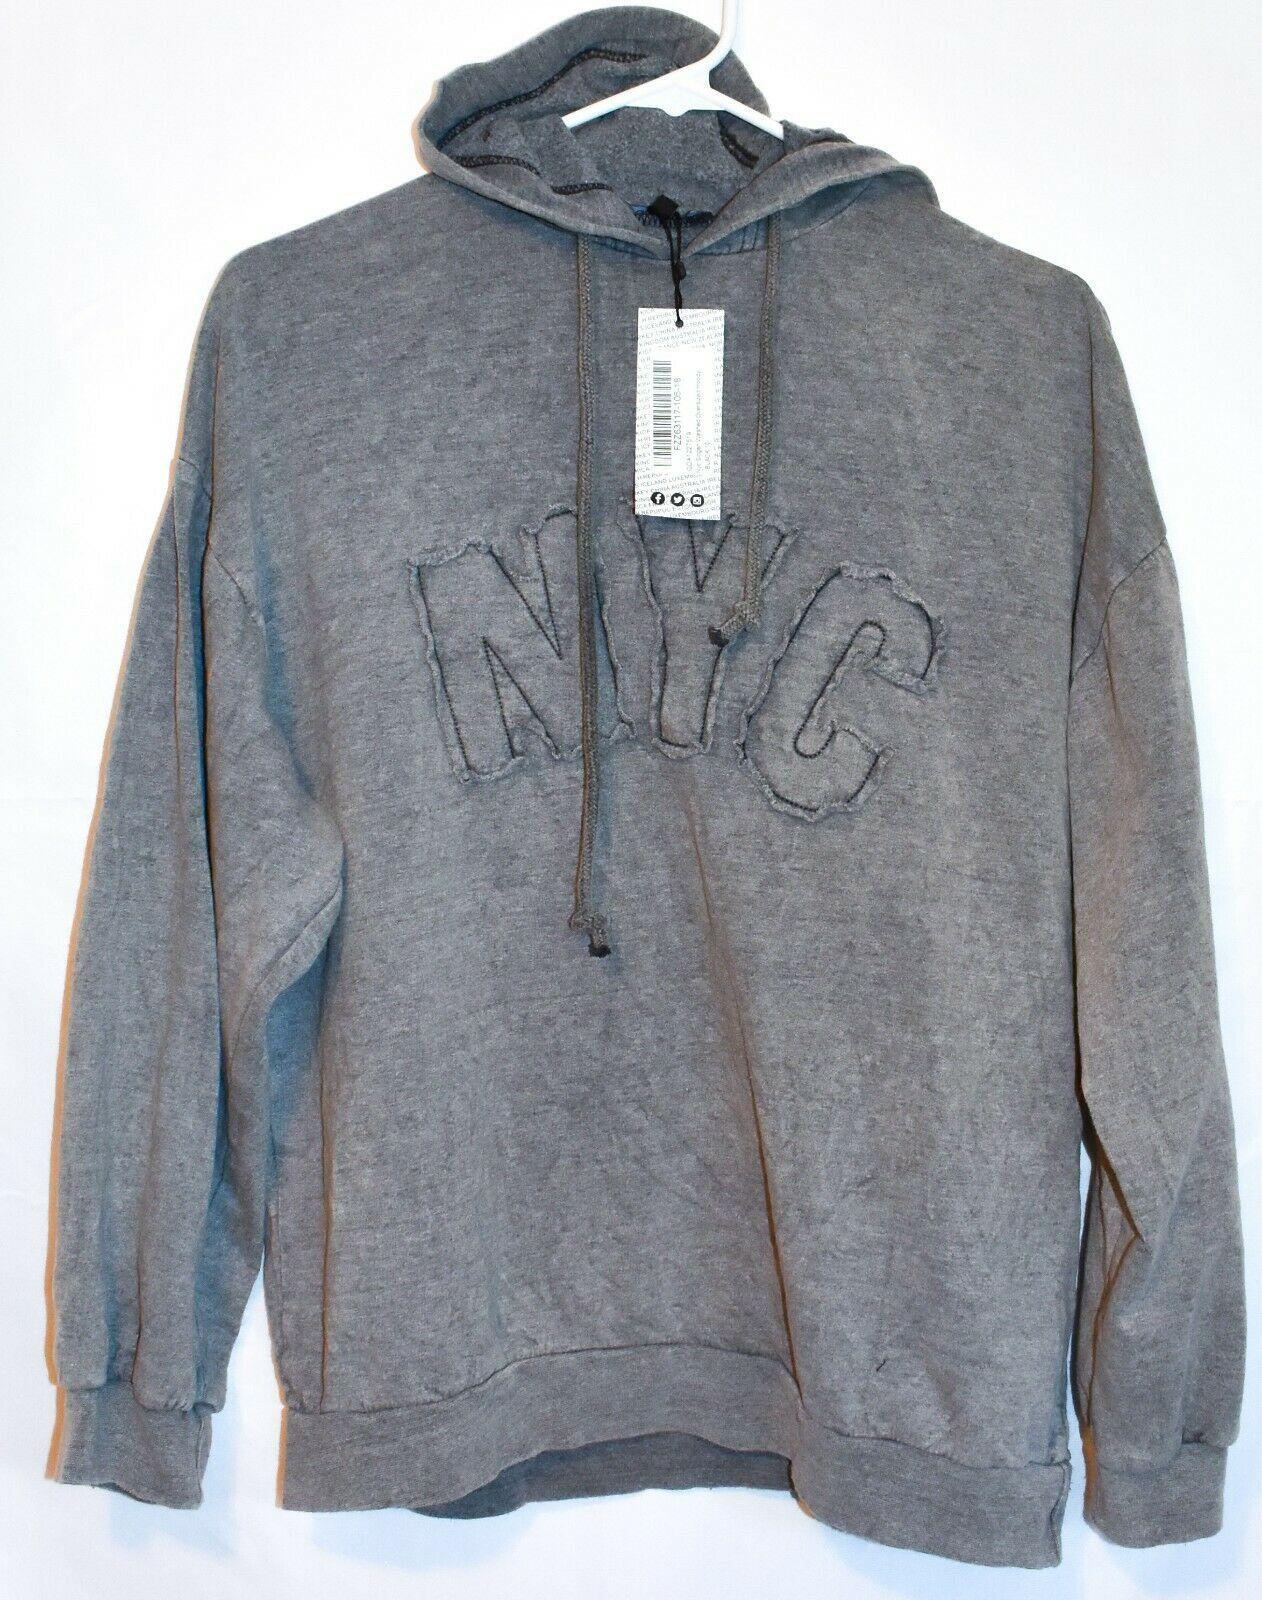 Boohoo Women's NYC Slogan Washed Gray Oversized Hooded Sweatshirt Size US 6 NWT